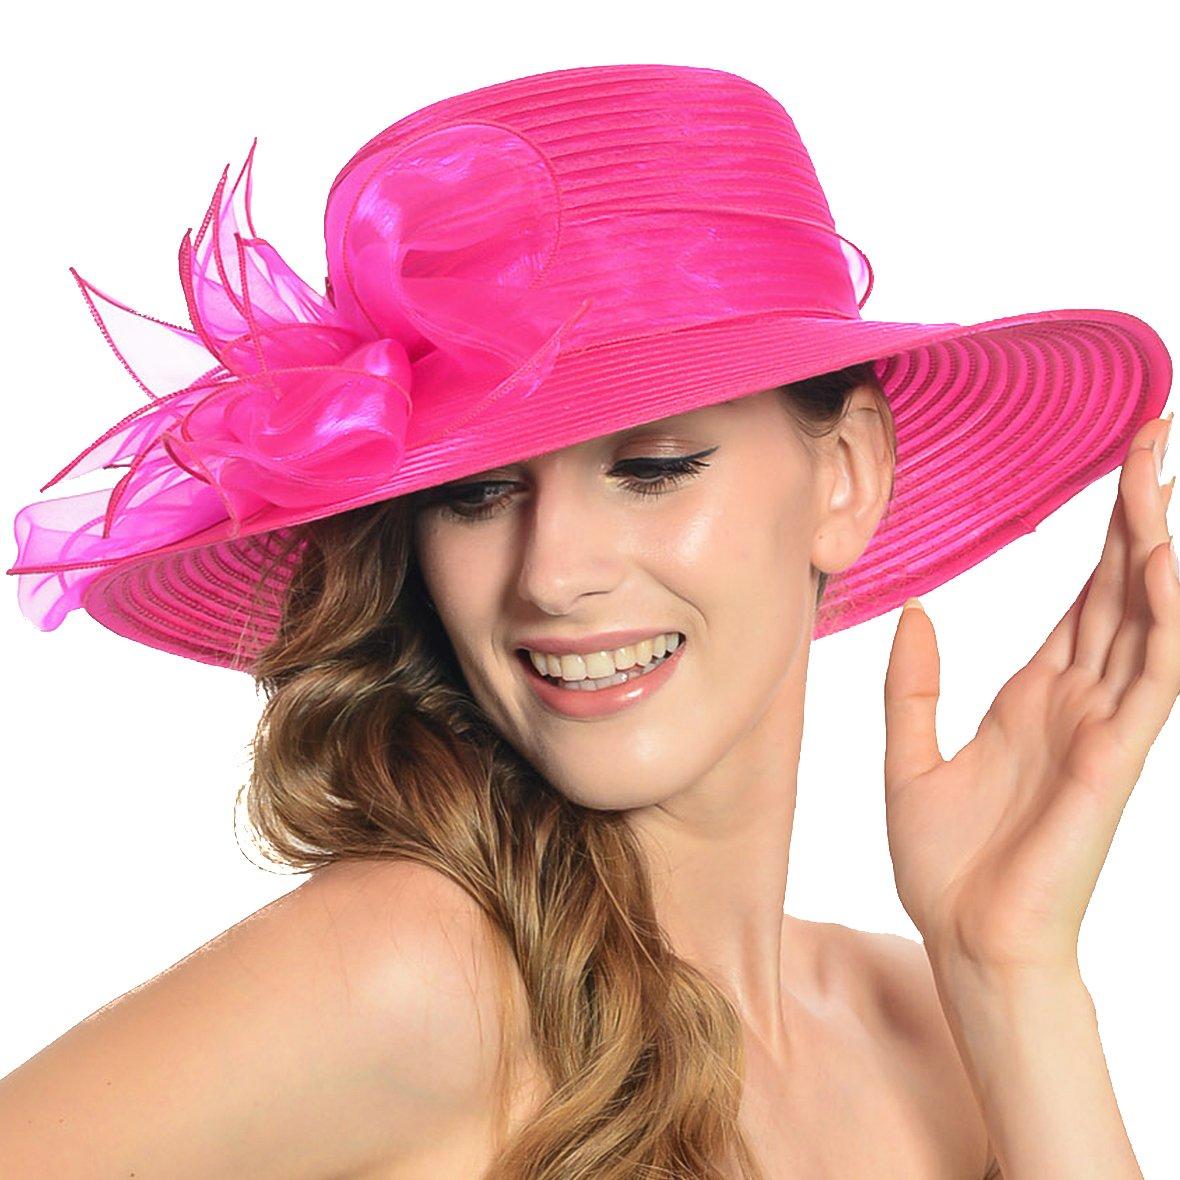 Women Organza Floral Derby Dress Church Wedding Party Hat S052-zr (Hot Pink)